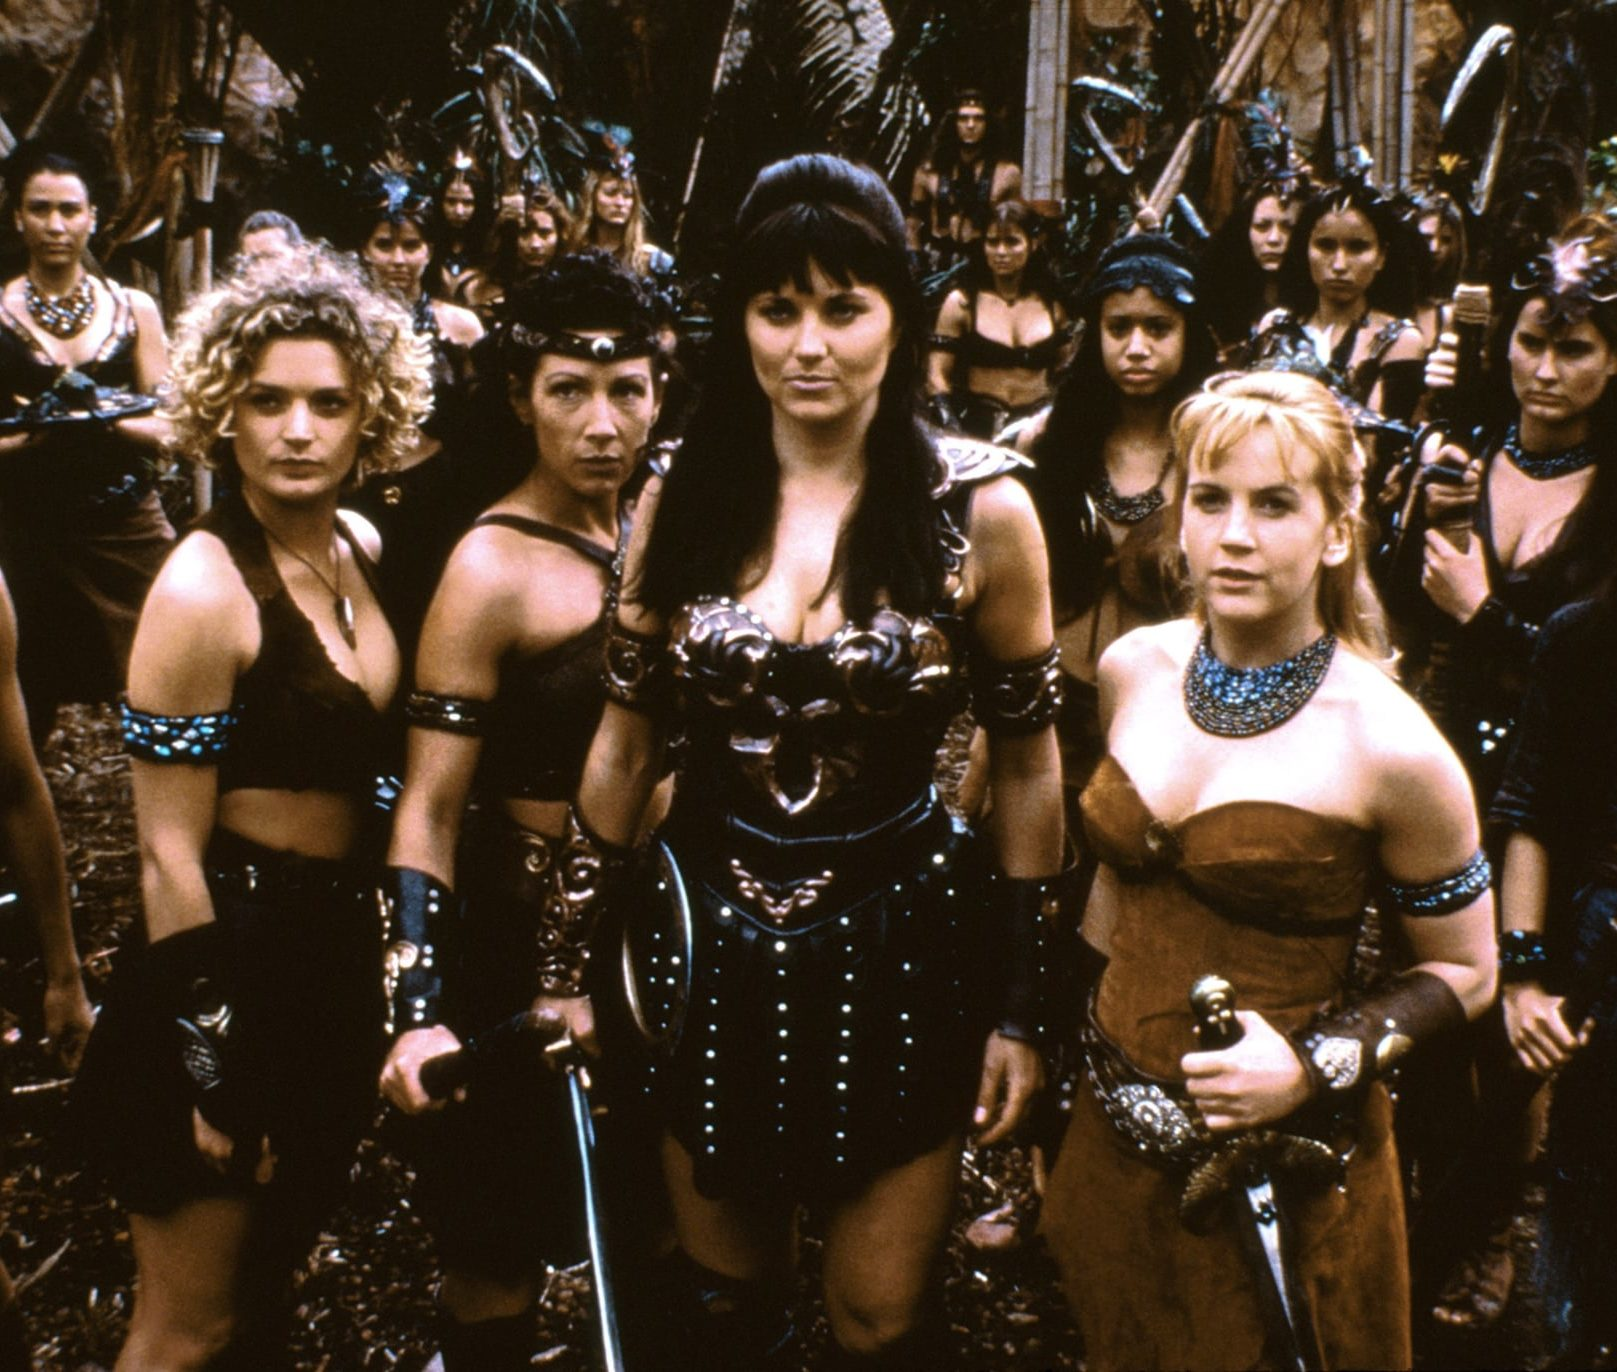 Xena Warrior Princess e1610100703285 20 Things You Never Knew About Xena: Warrior Princess